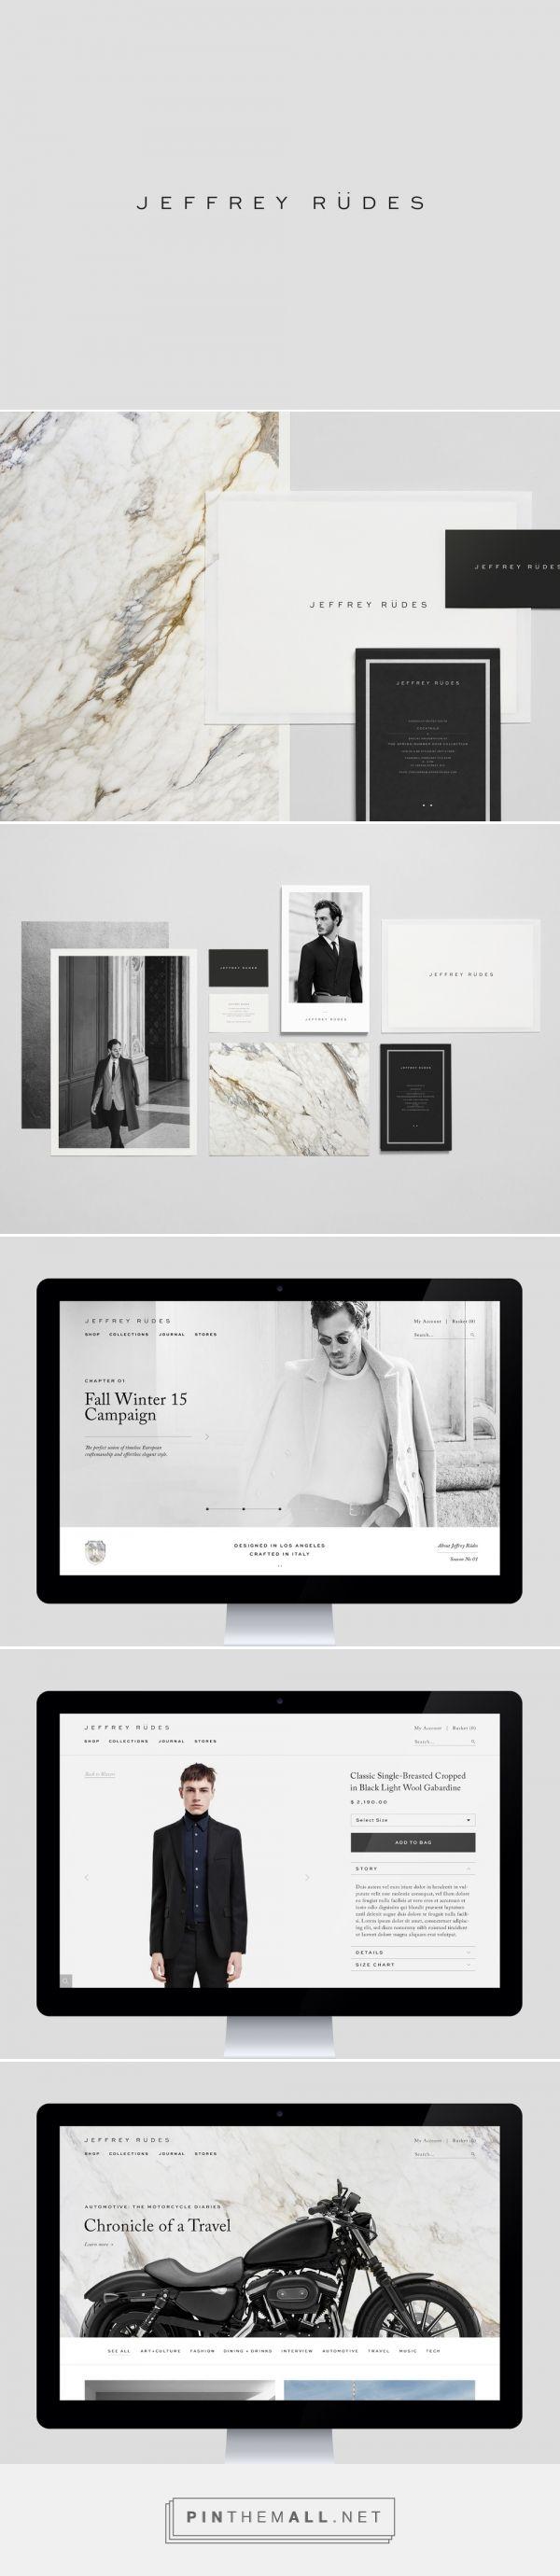 Jeffrey Rudes Branding by Object-Matter | Fivestar Branding – Design and Branding Agency & Inspiration Gallery